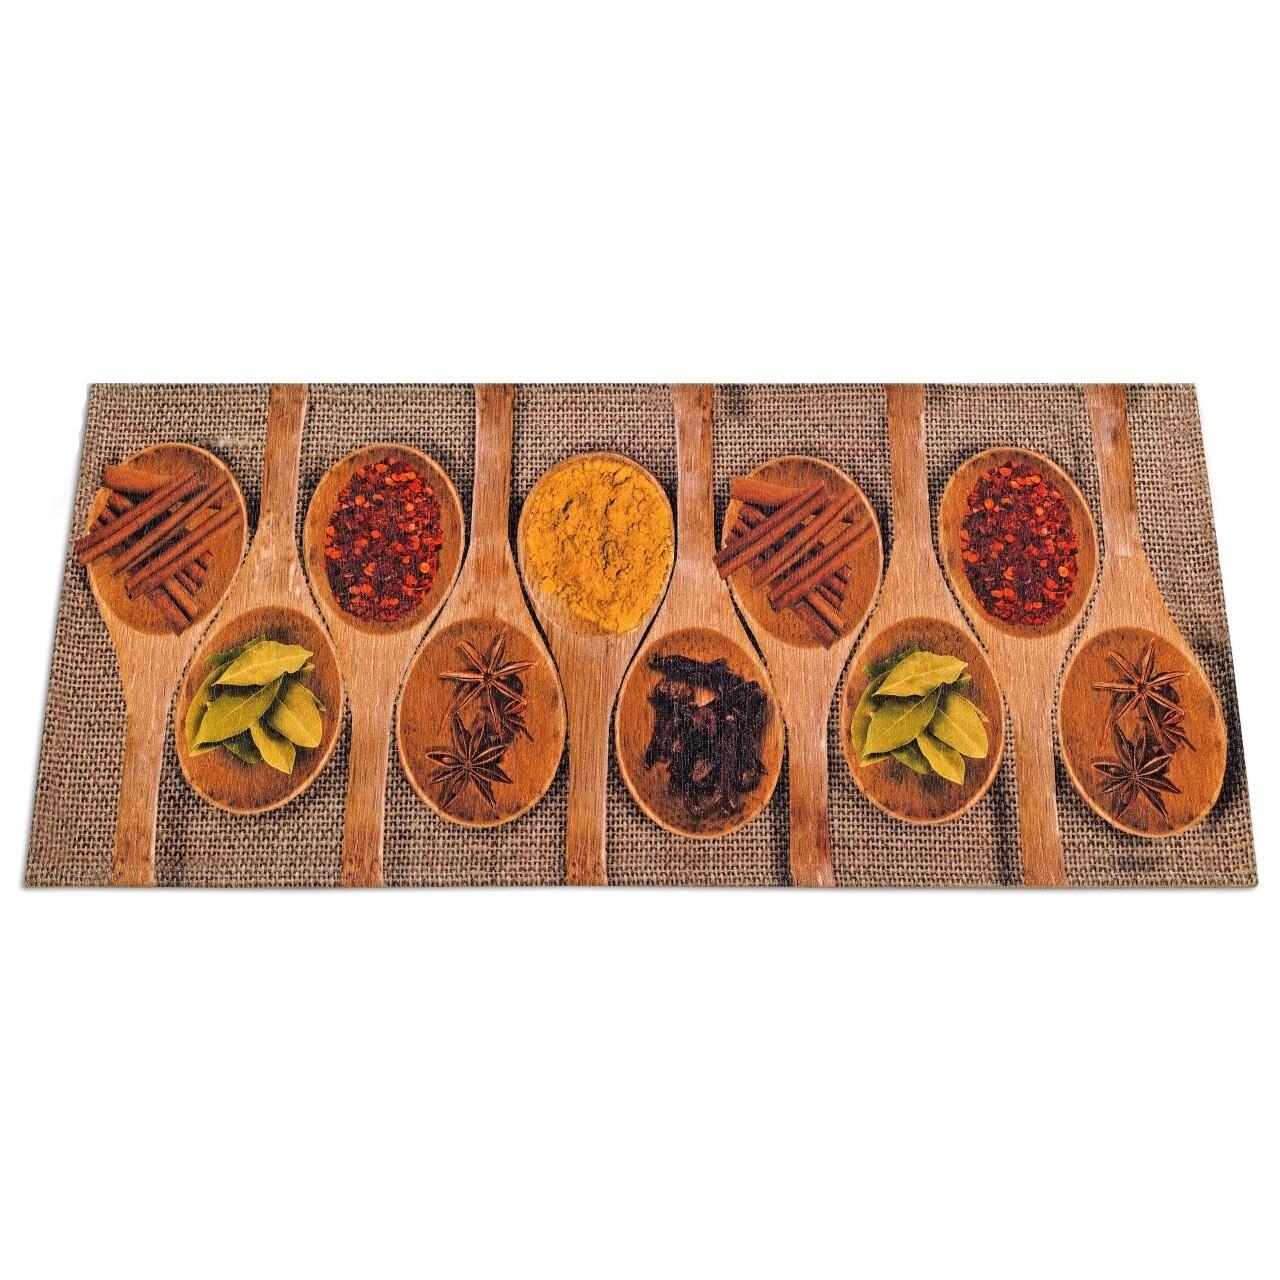 Covor rezistent Webtappeti Spices Market 60x115 cm, maro